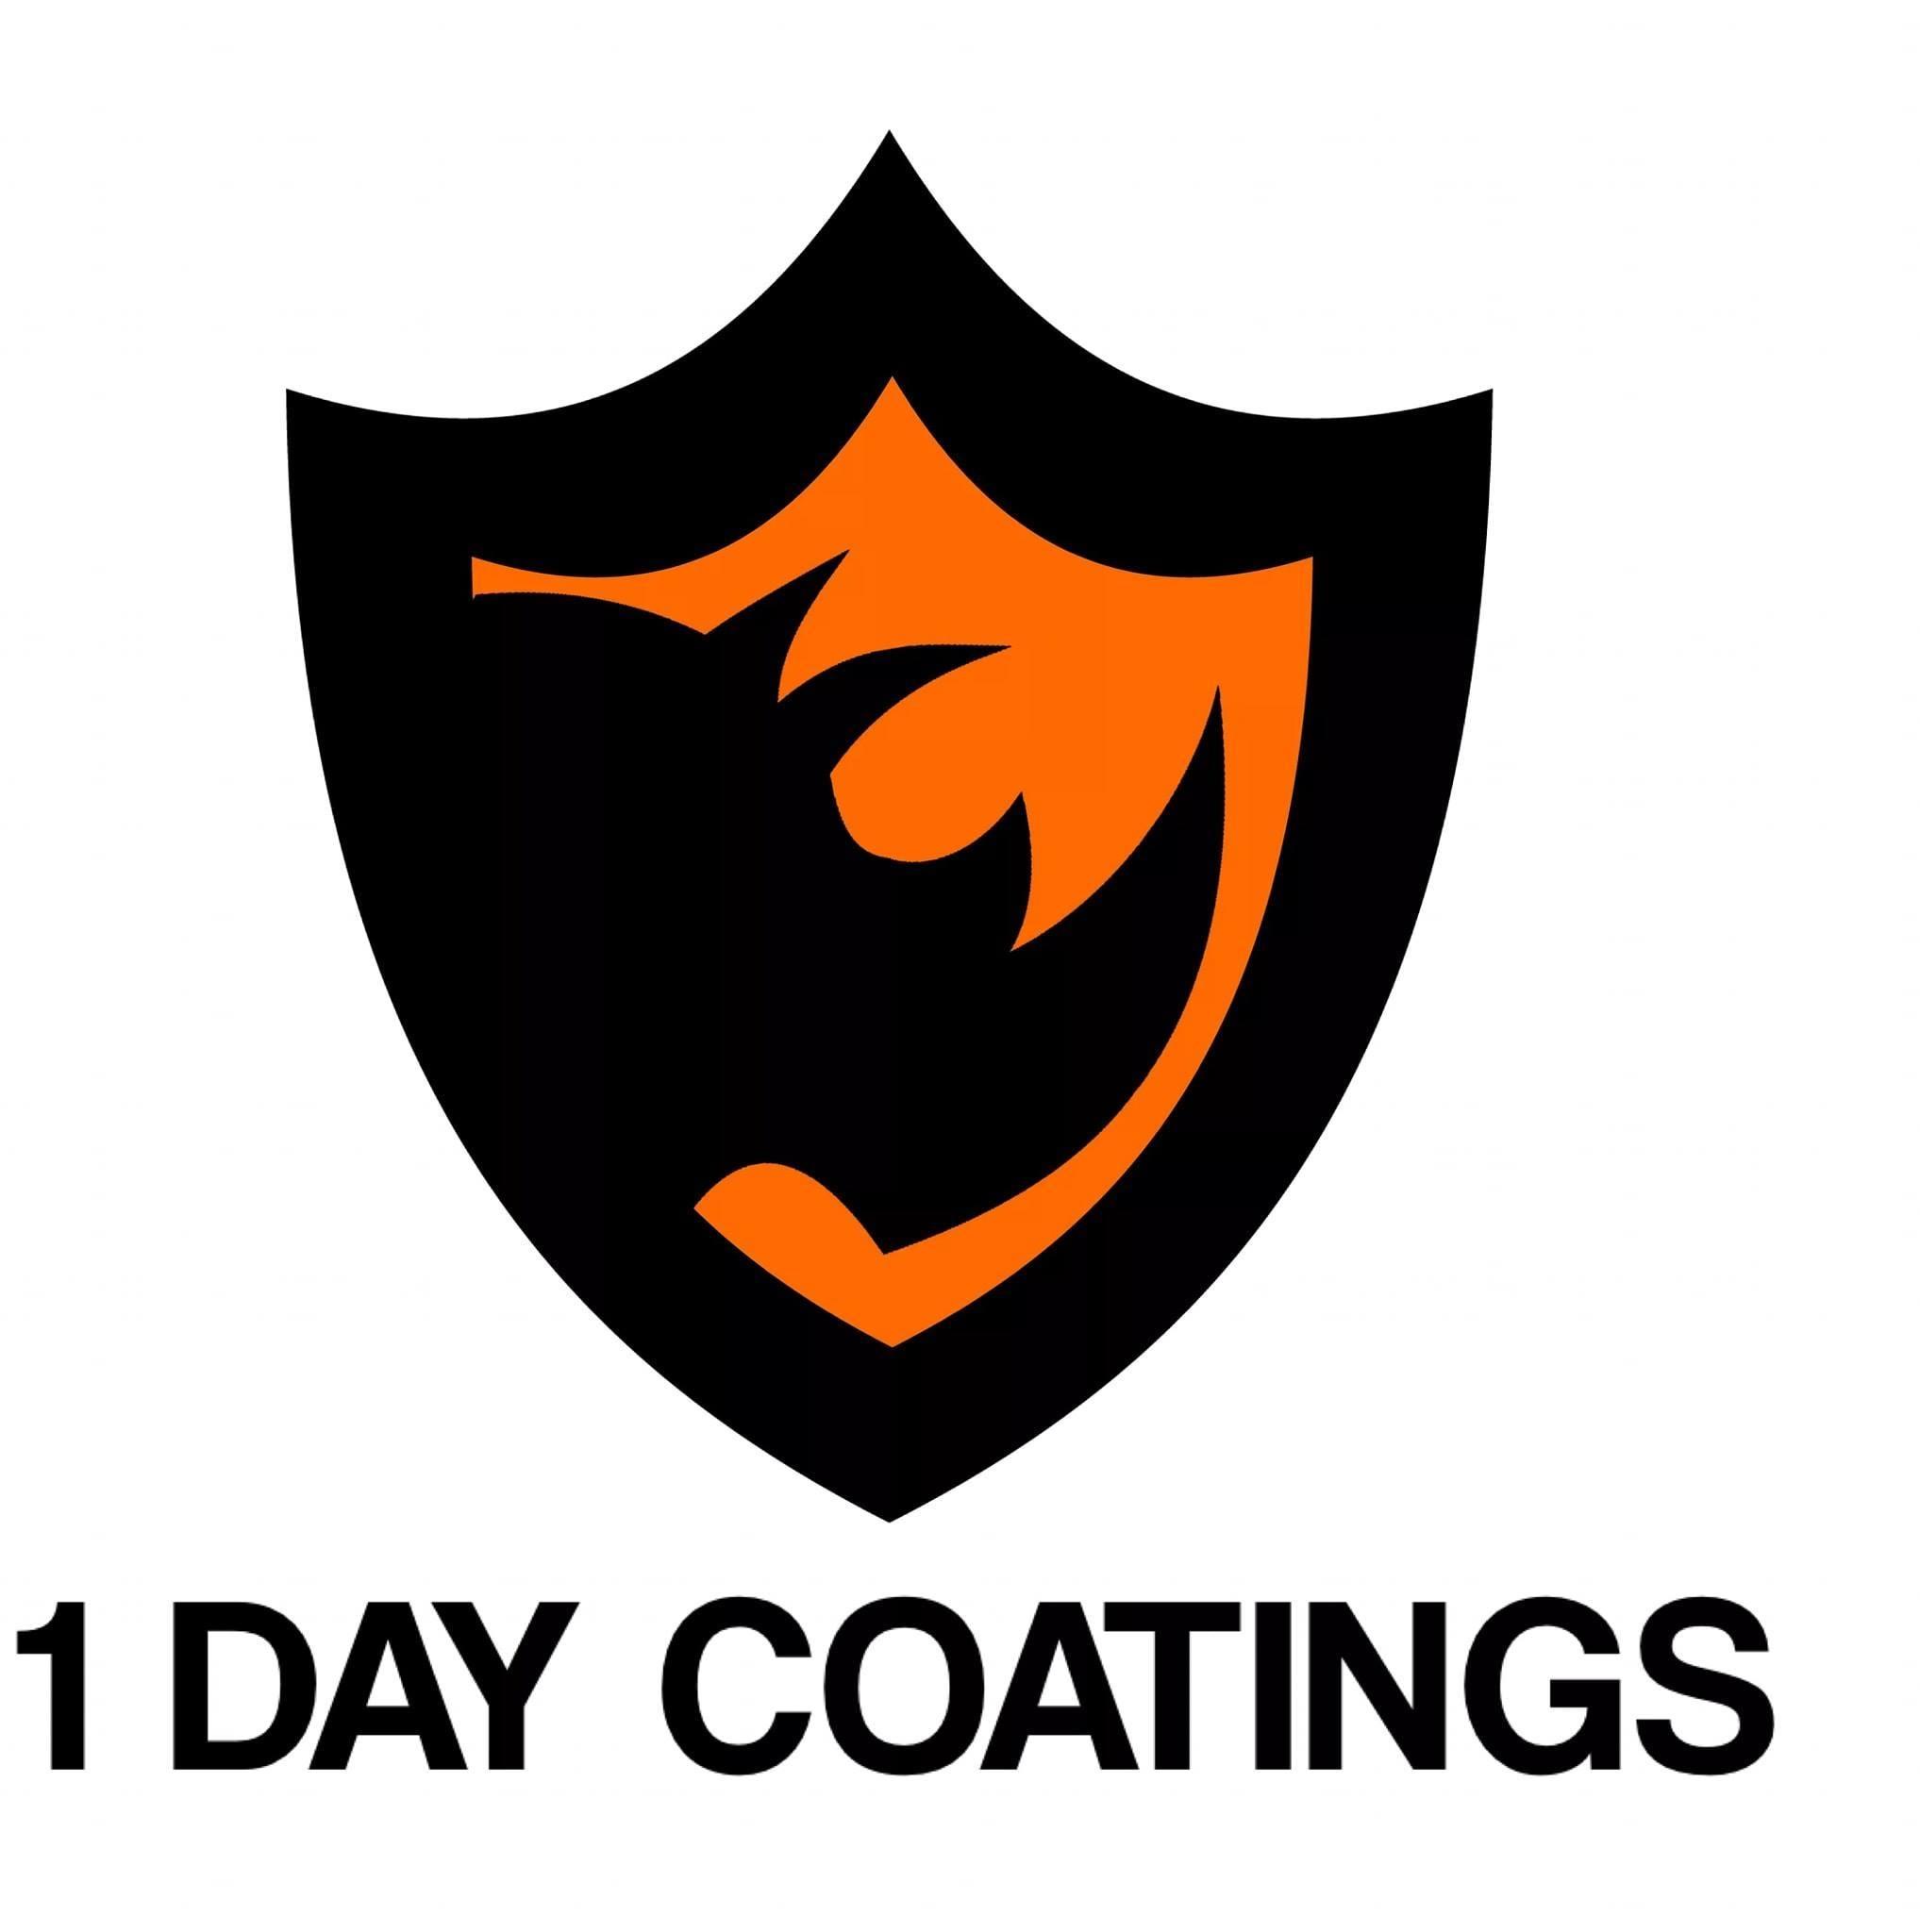 1 Day Coatings